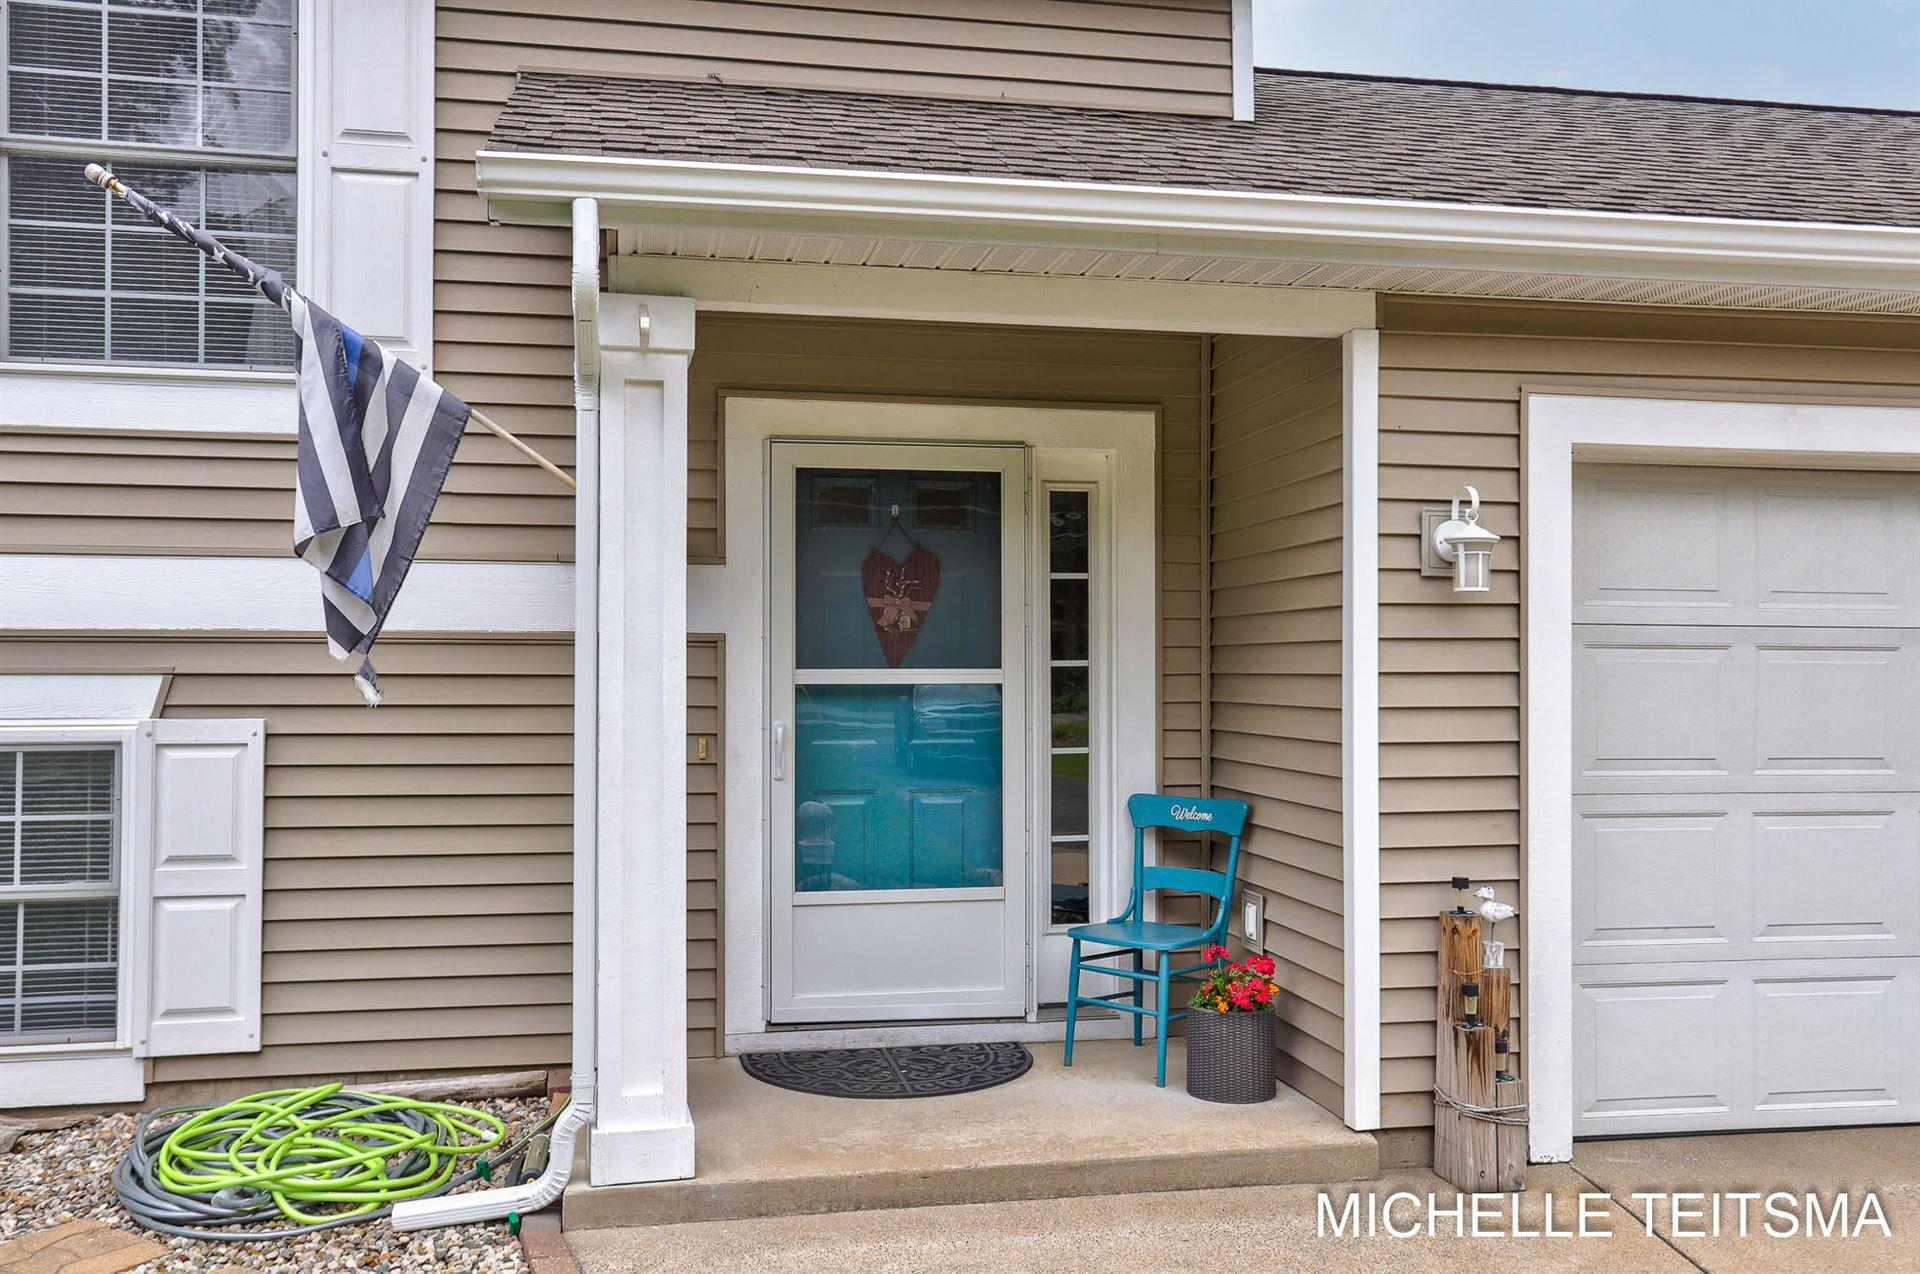 Photo of 15449 Comstock Street, Grand Haven, MI 49417 (MLS # 21026940)